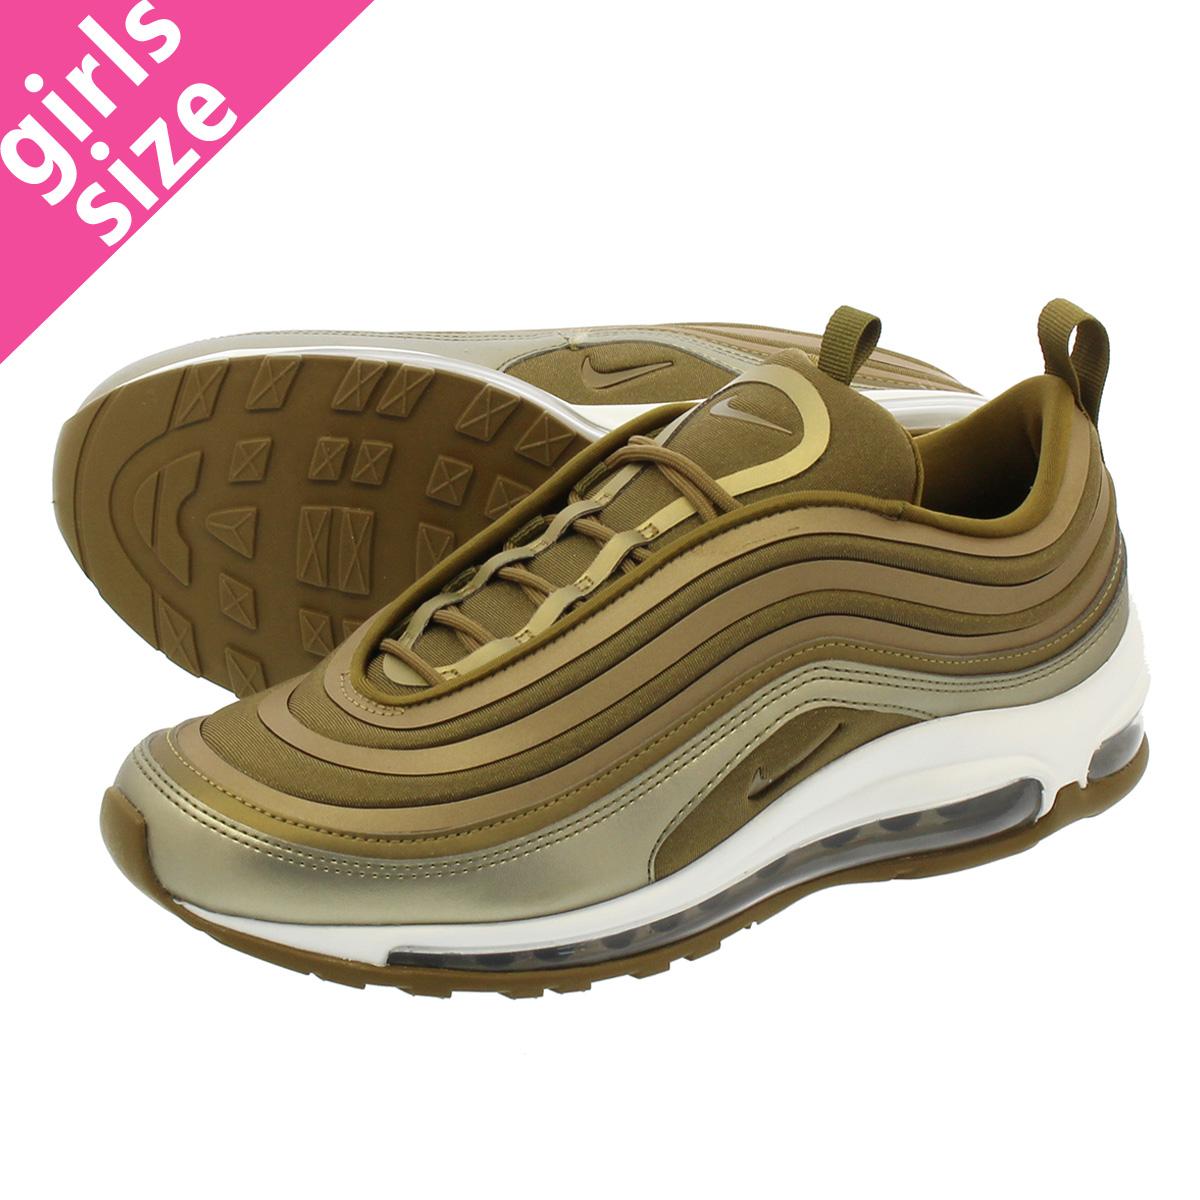 Womens Nike Air Max 97 Ultra '17 917704 901 Metallic